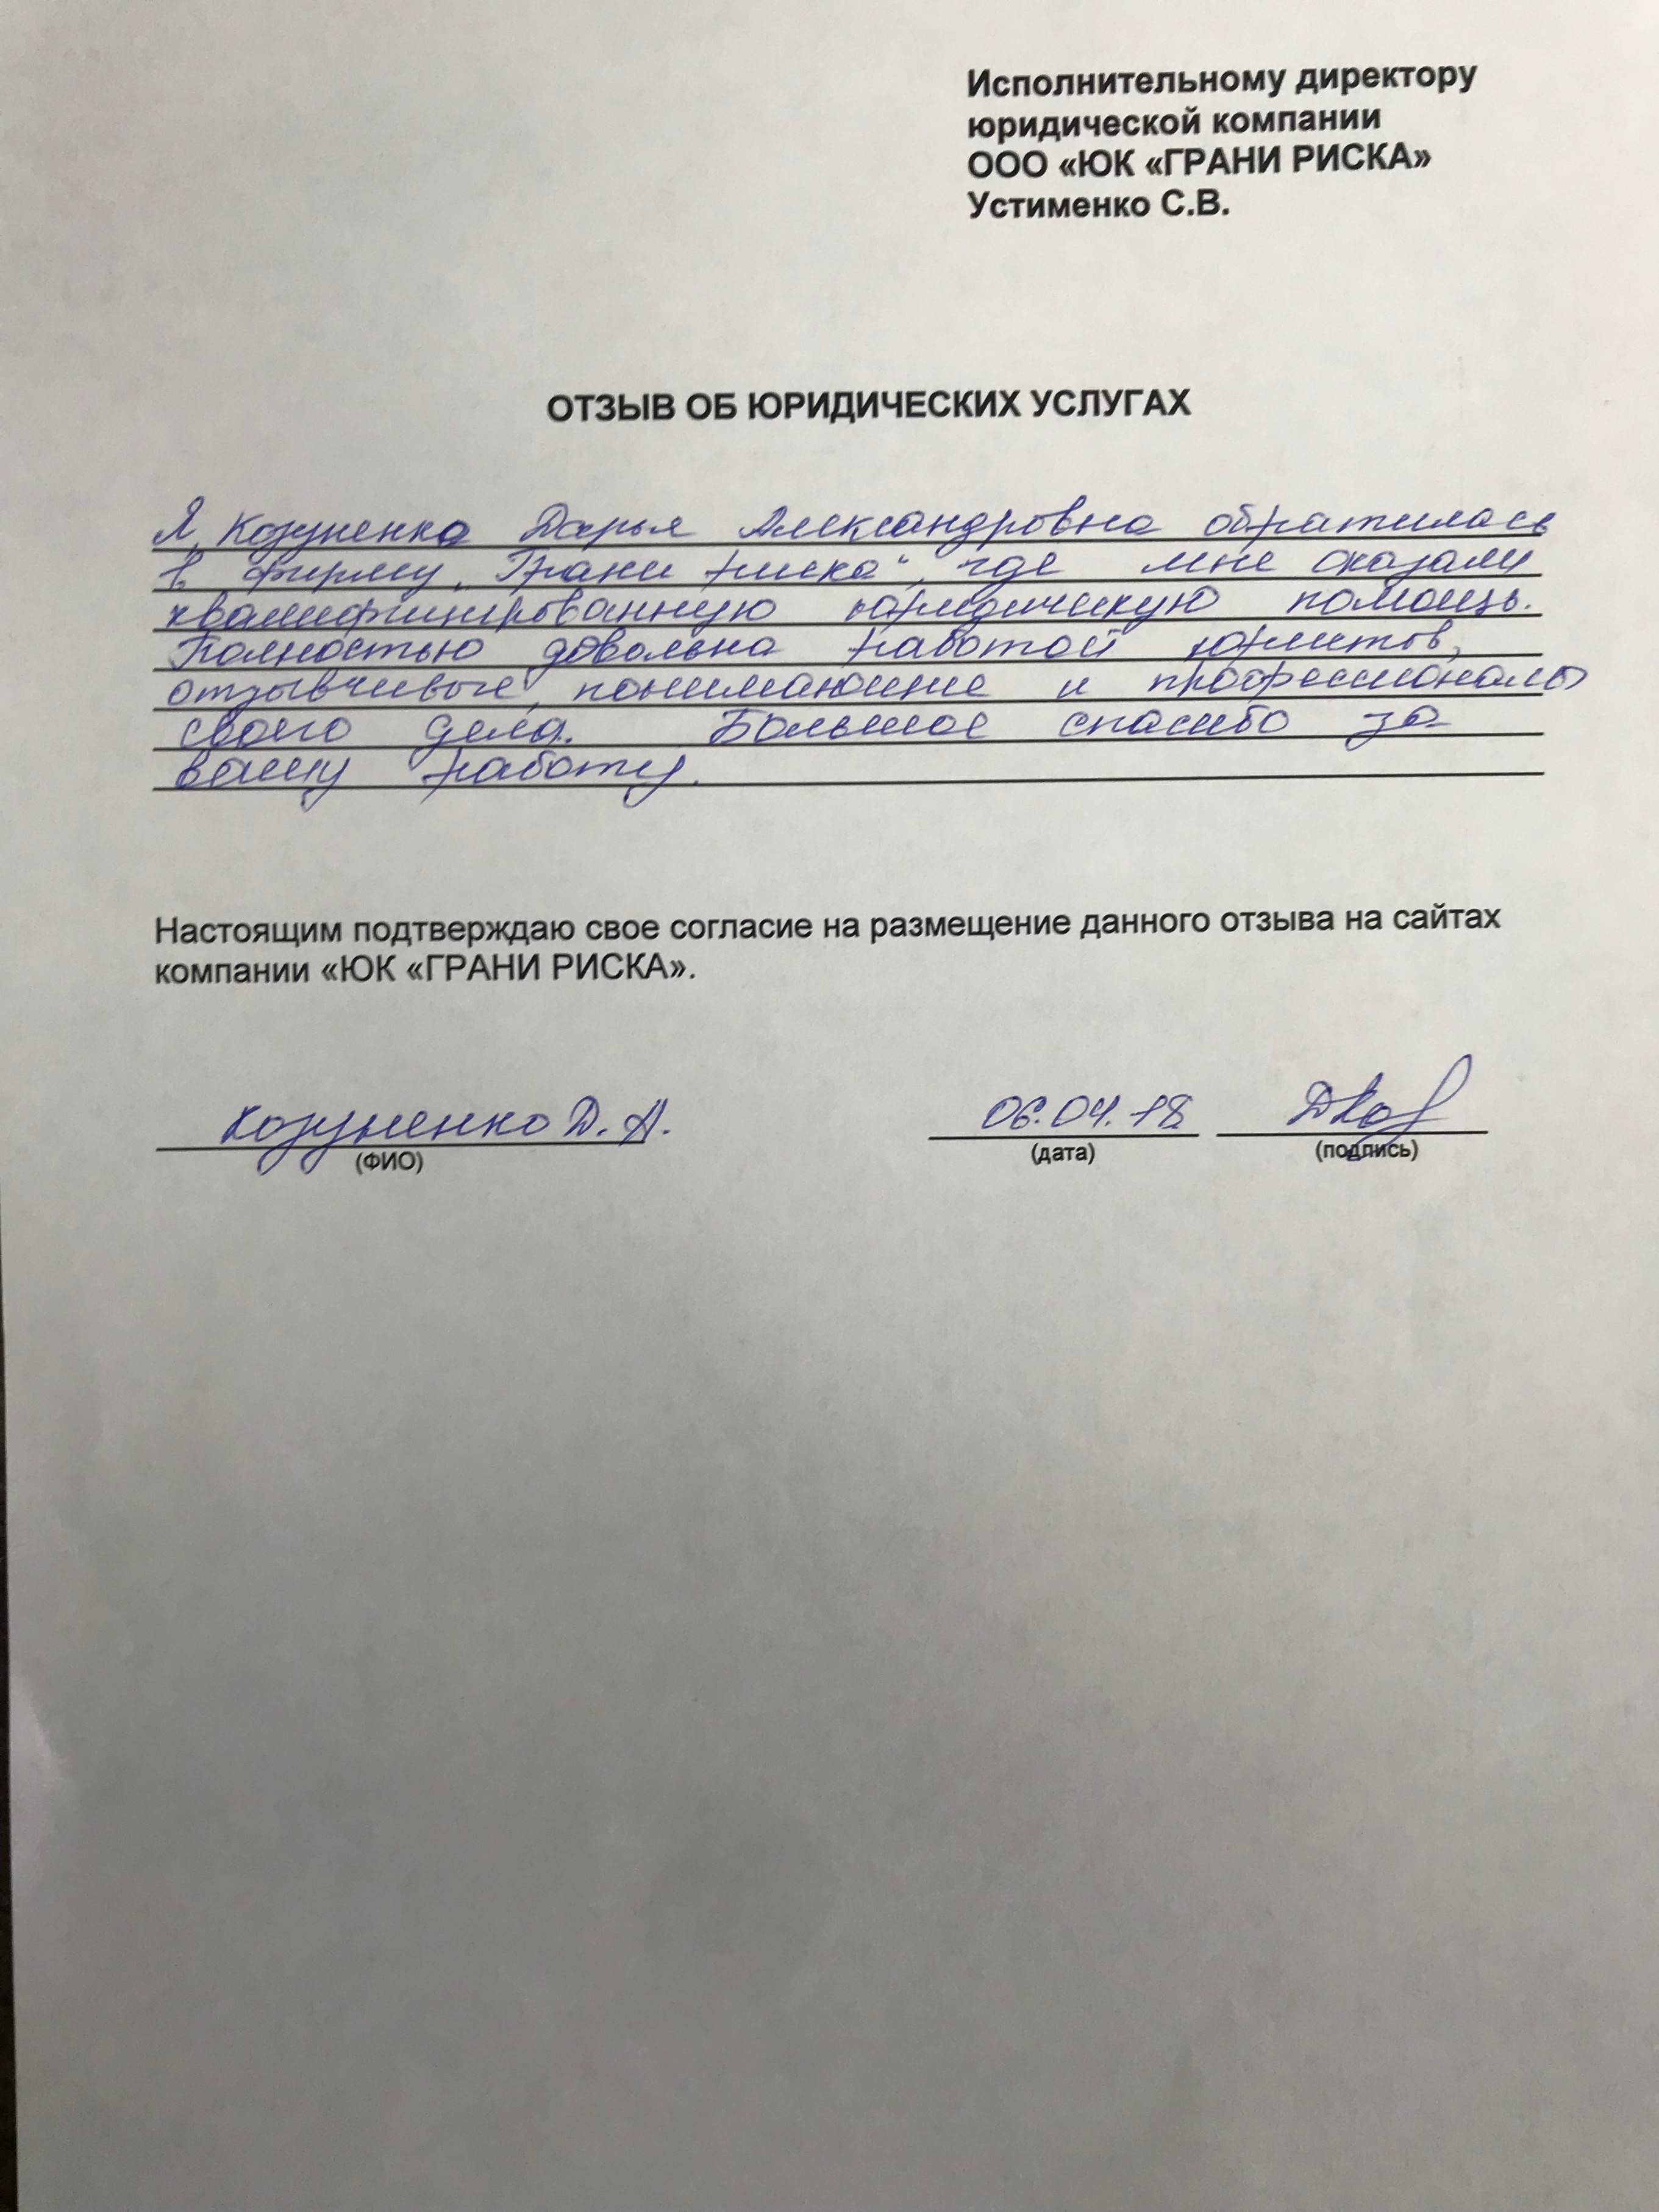 Отзыв Казуненко Д. А.